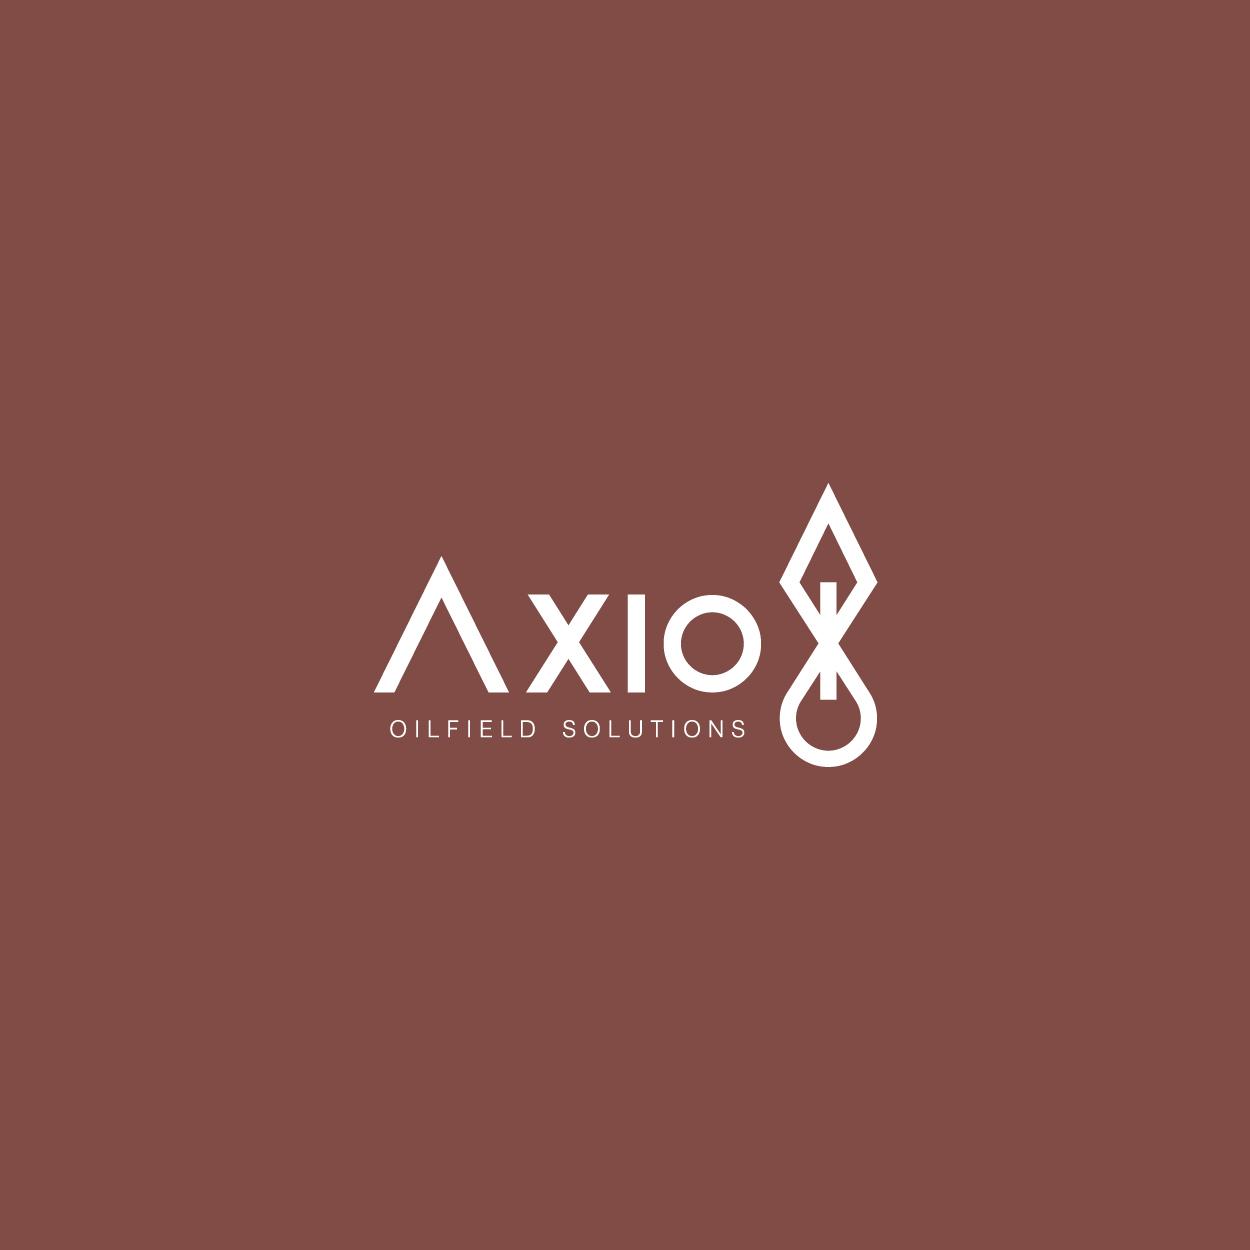 axio-logo-bg